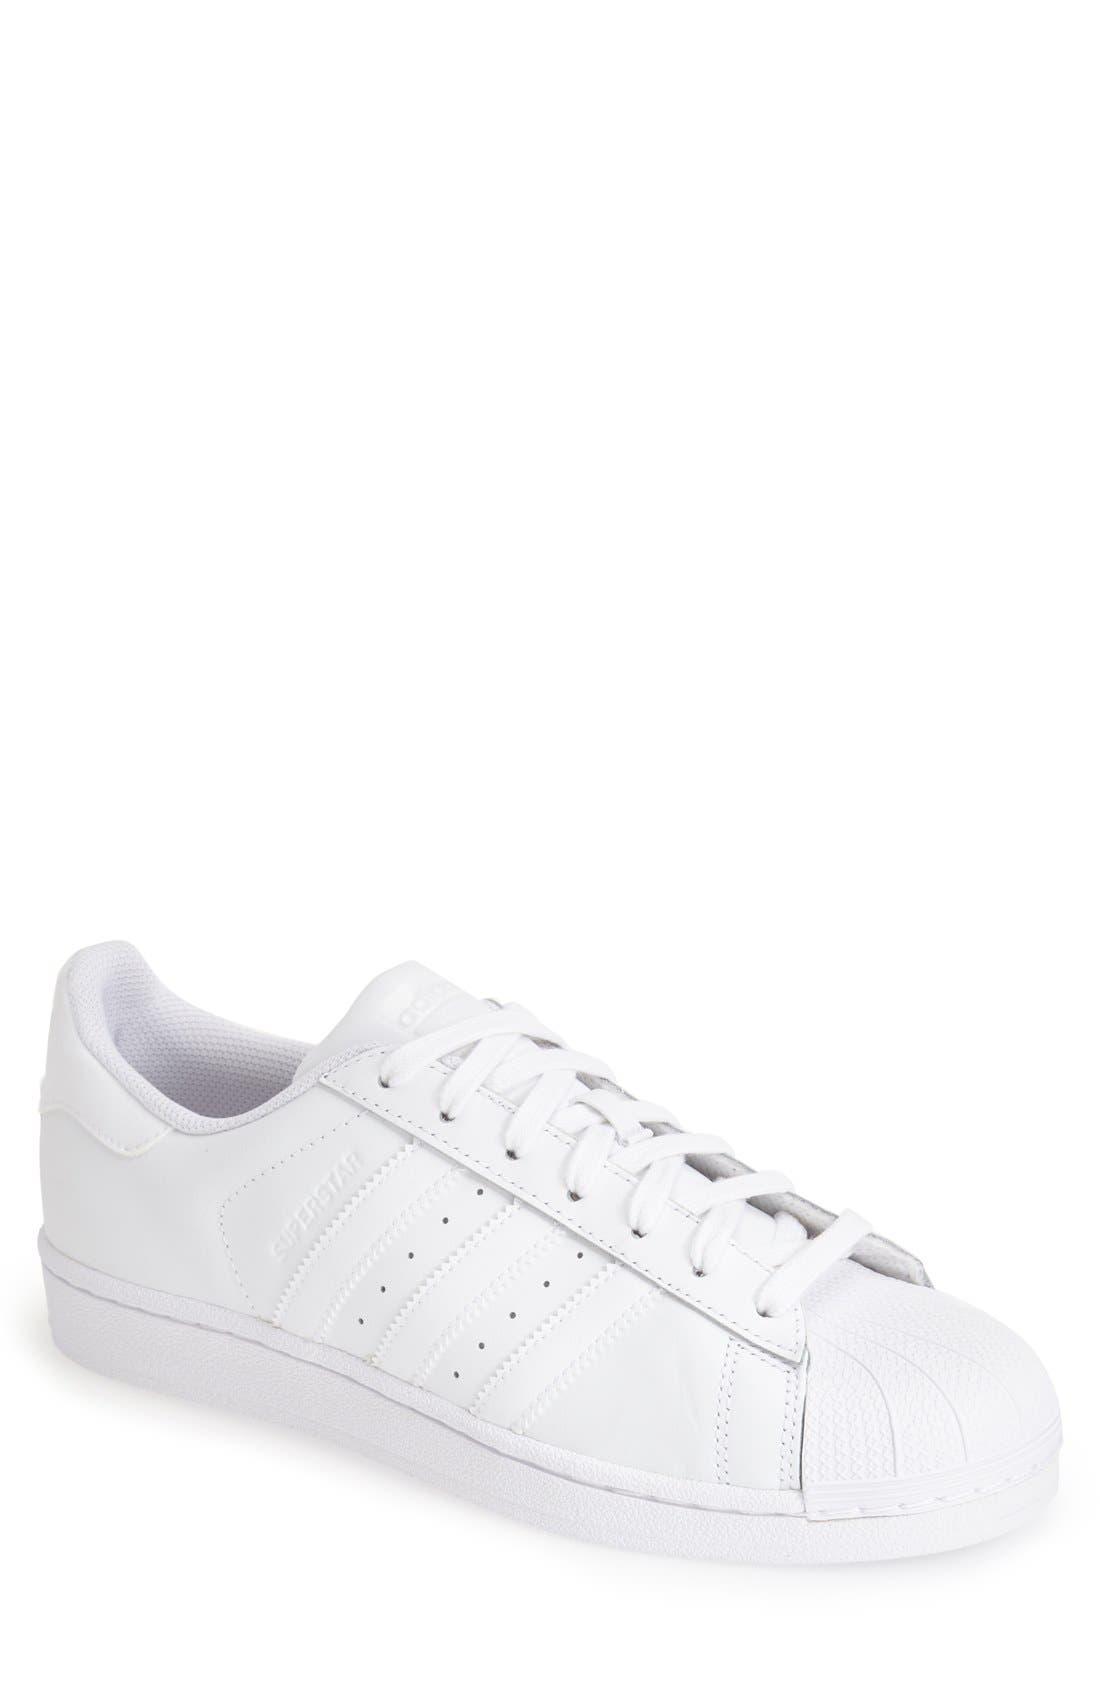 Alternate Image 1 Selected - adidas Superstar Foundation Sneaker